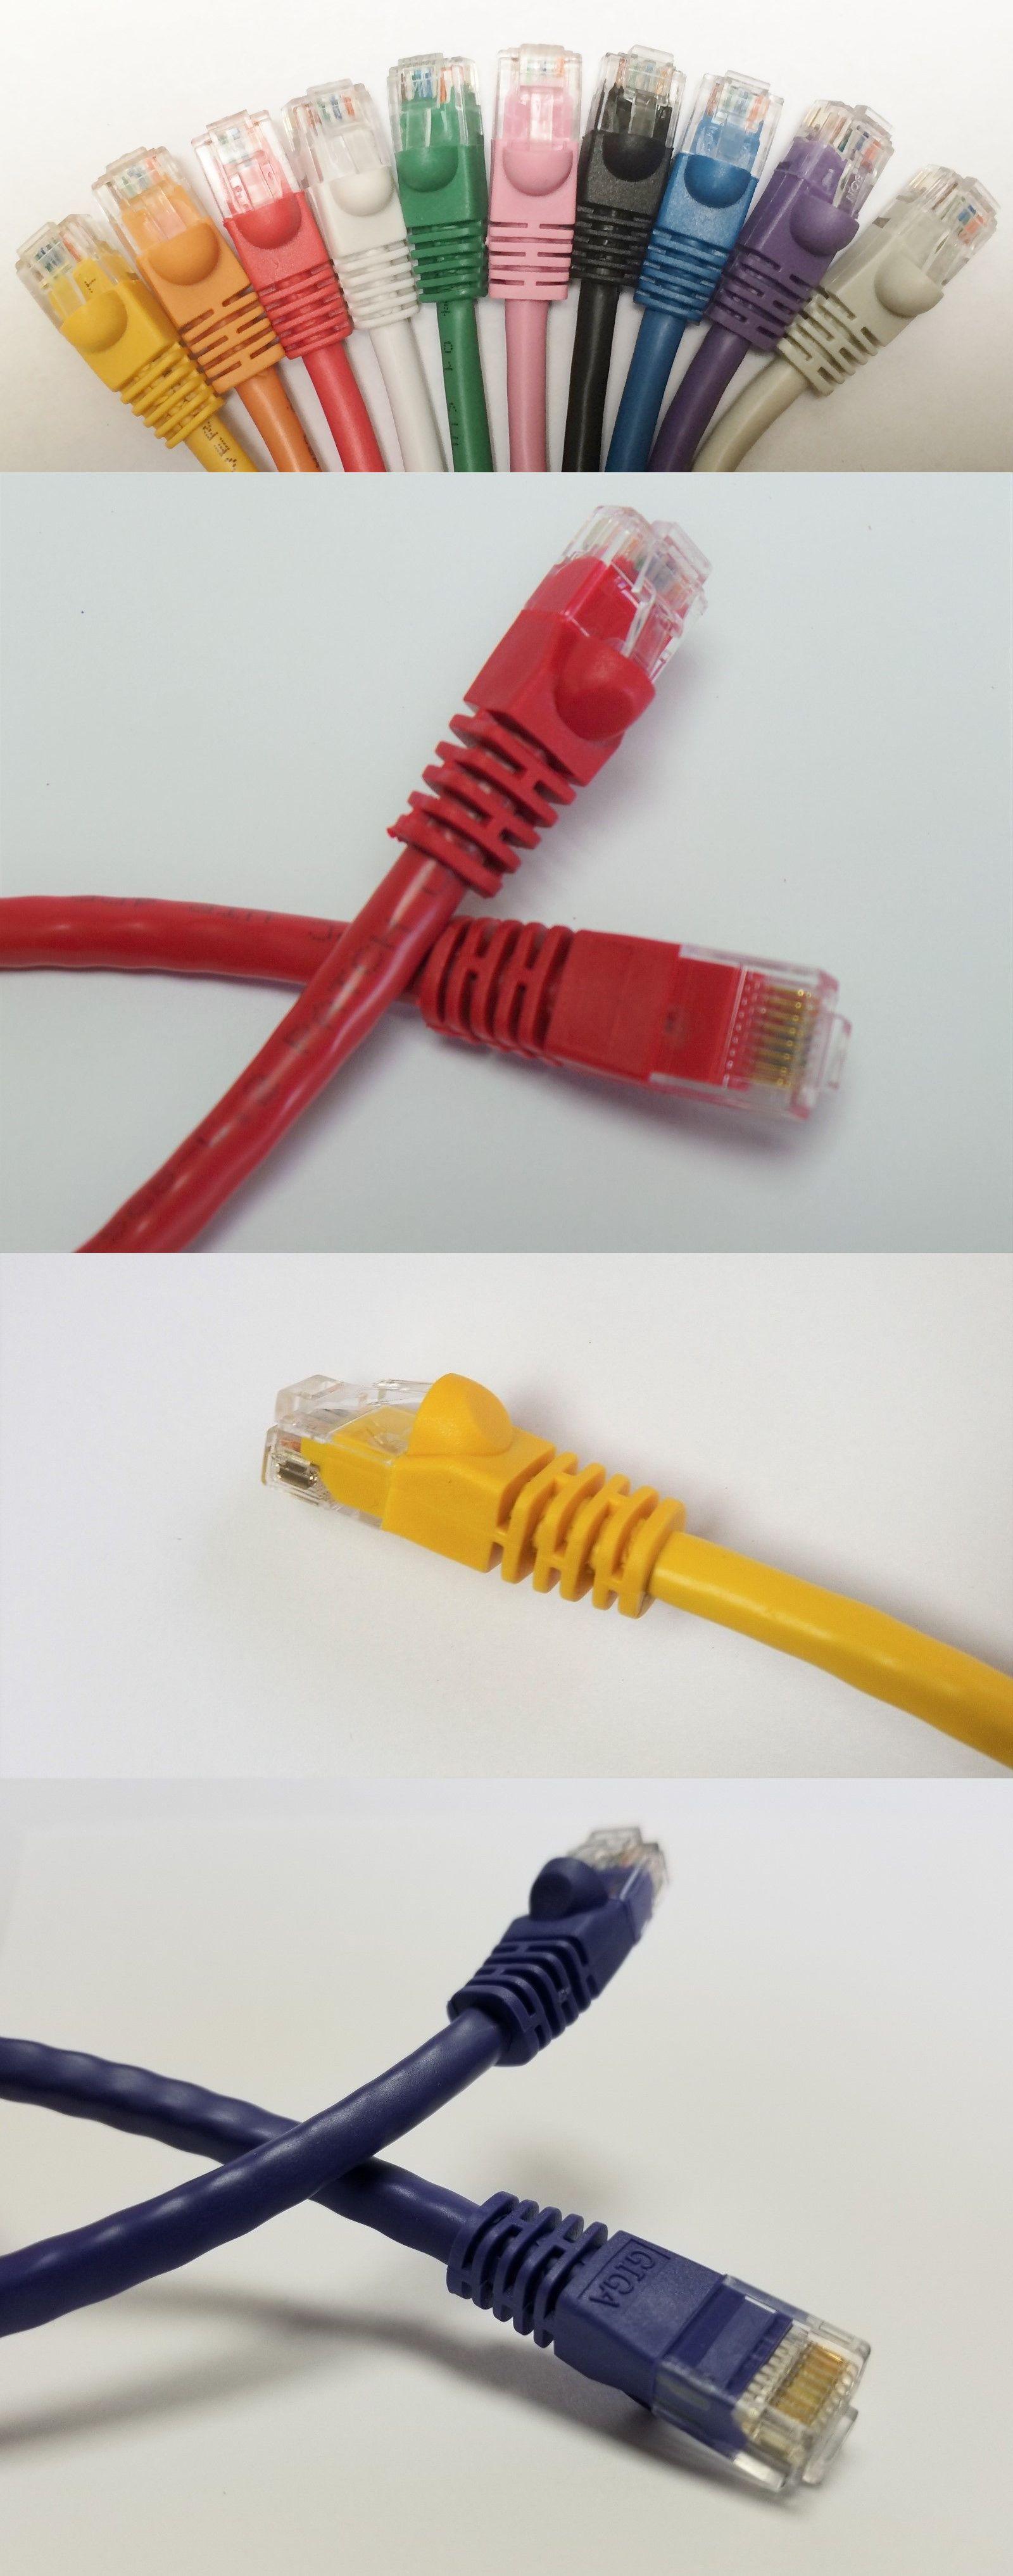 5ft CAT5e Ethernet Patch Cable Cord 350 MHz RJ45 10 Pack Lot Pick Colors